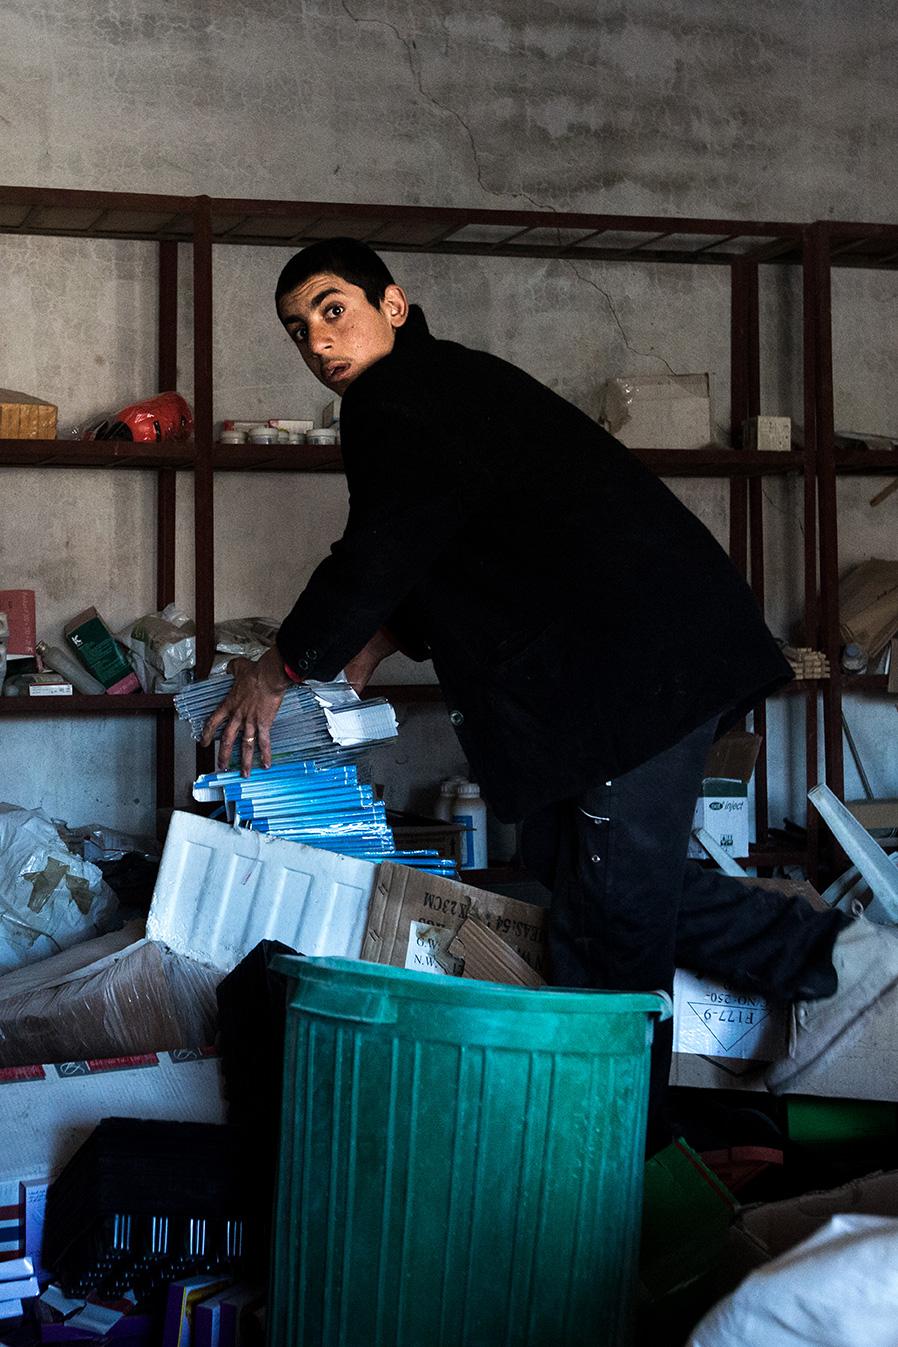 looter stealing books shop sinjar iraq after liberation